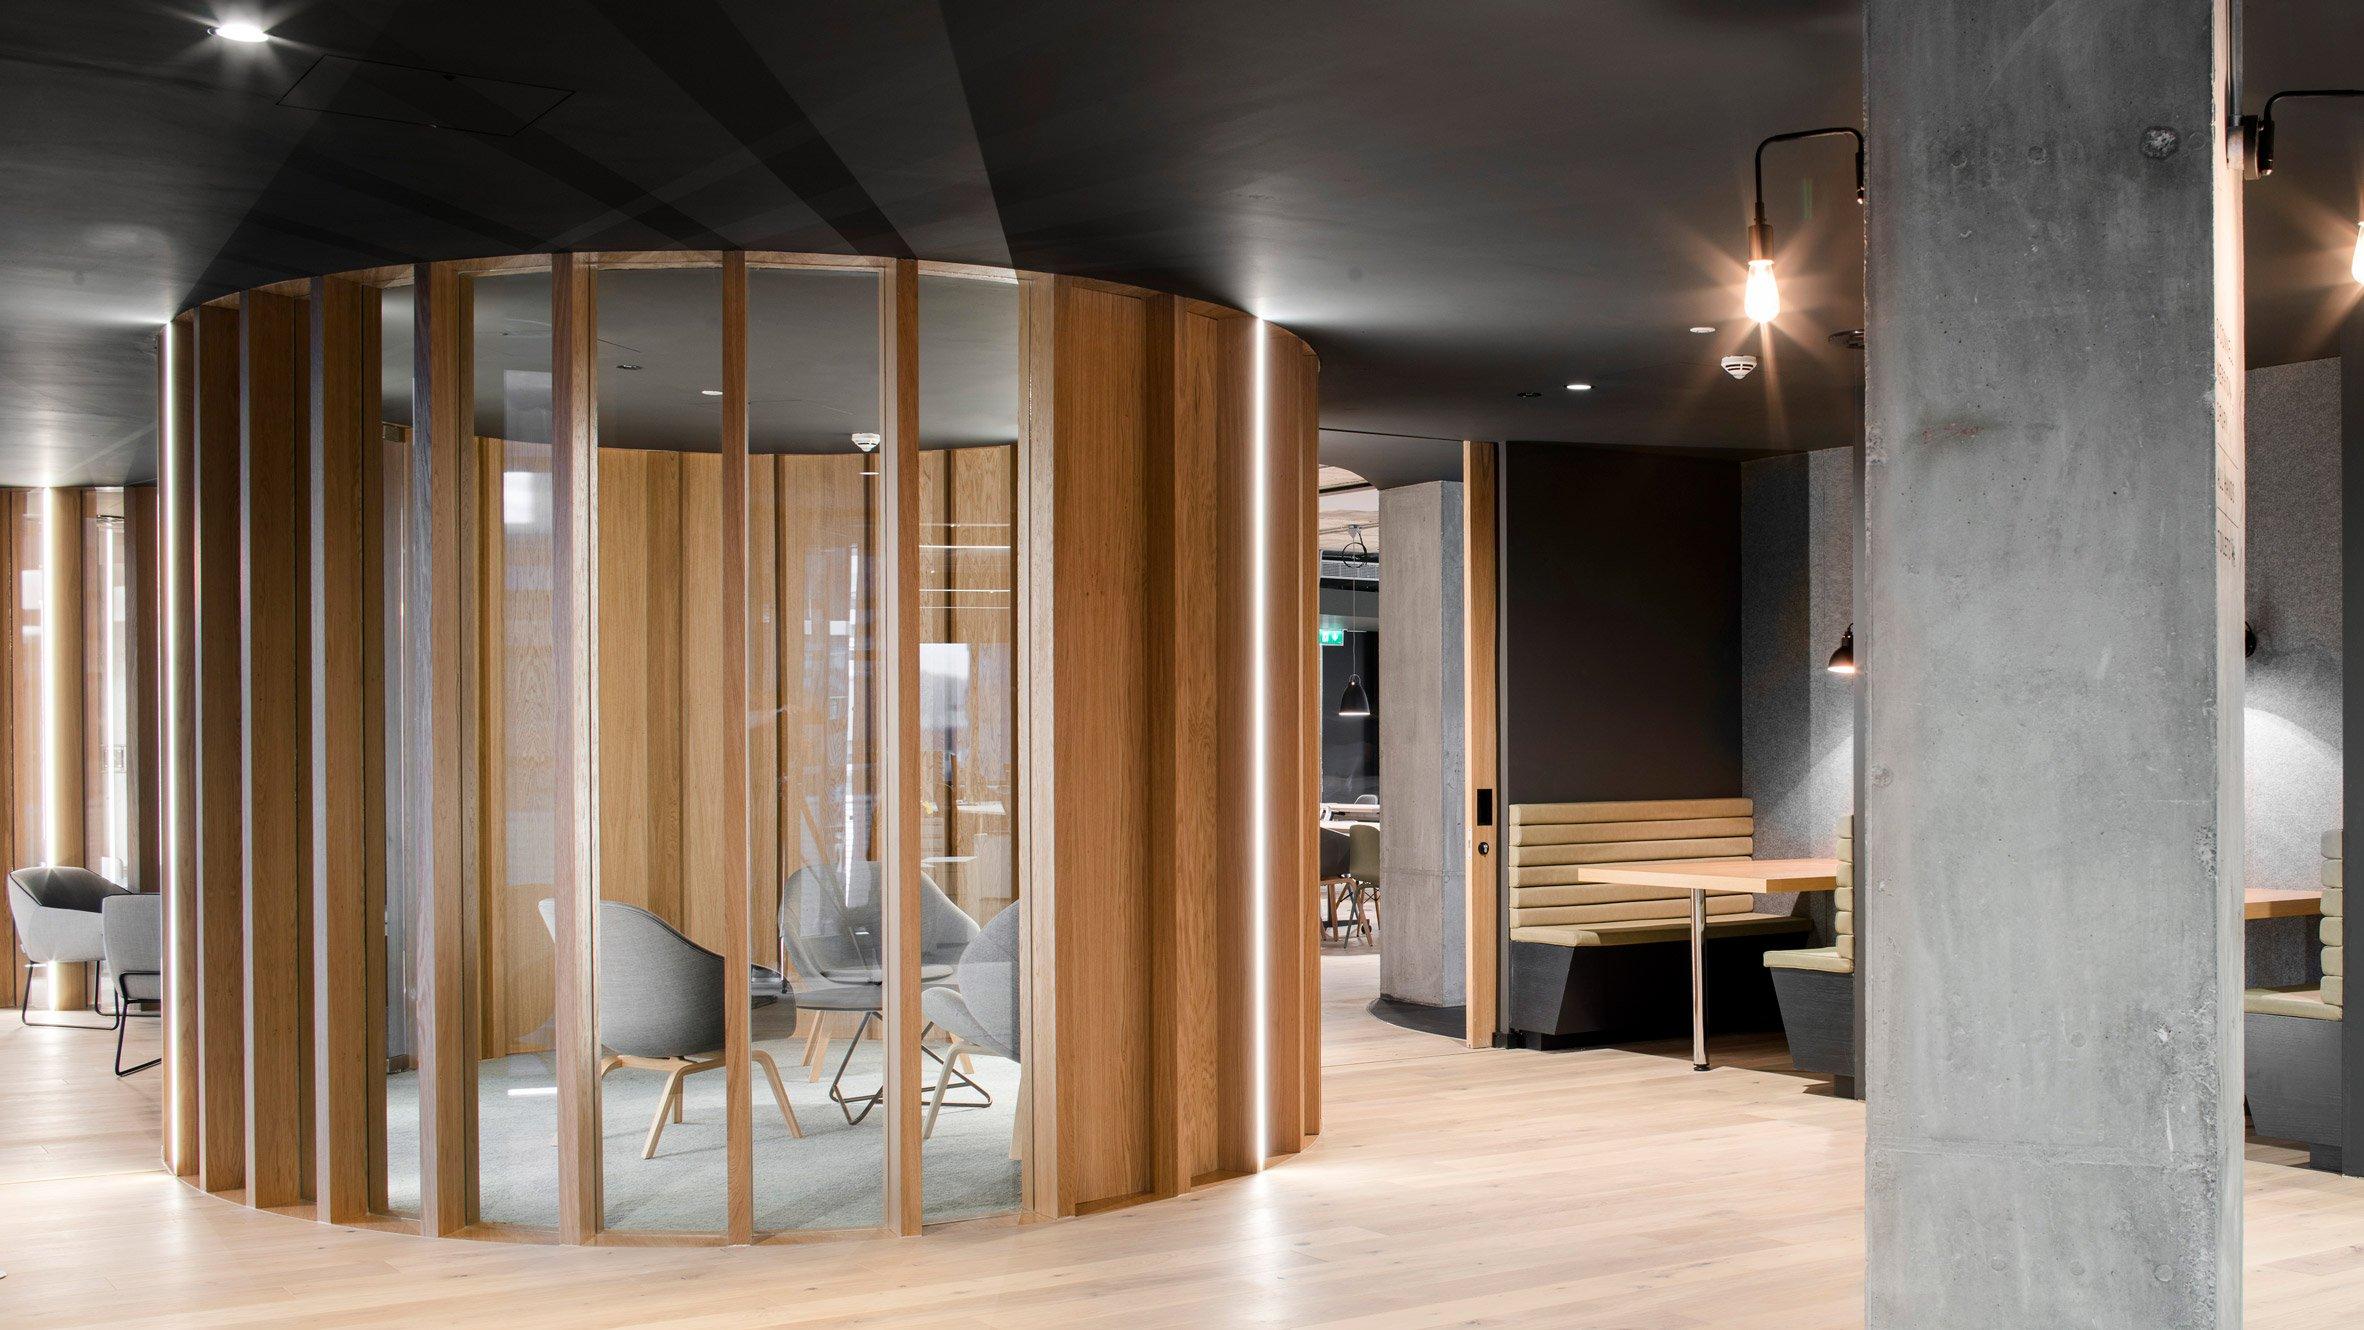 SLACK European HQ by ODOS Architects